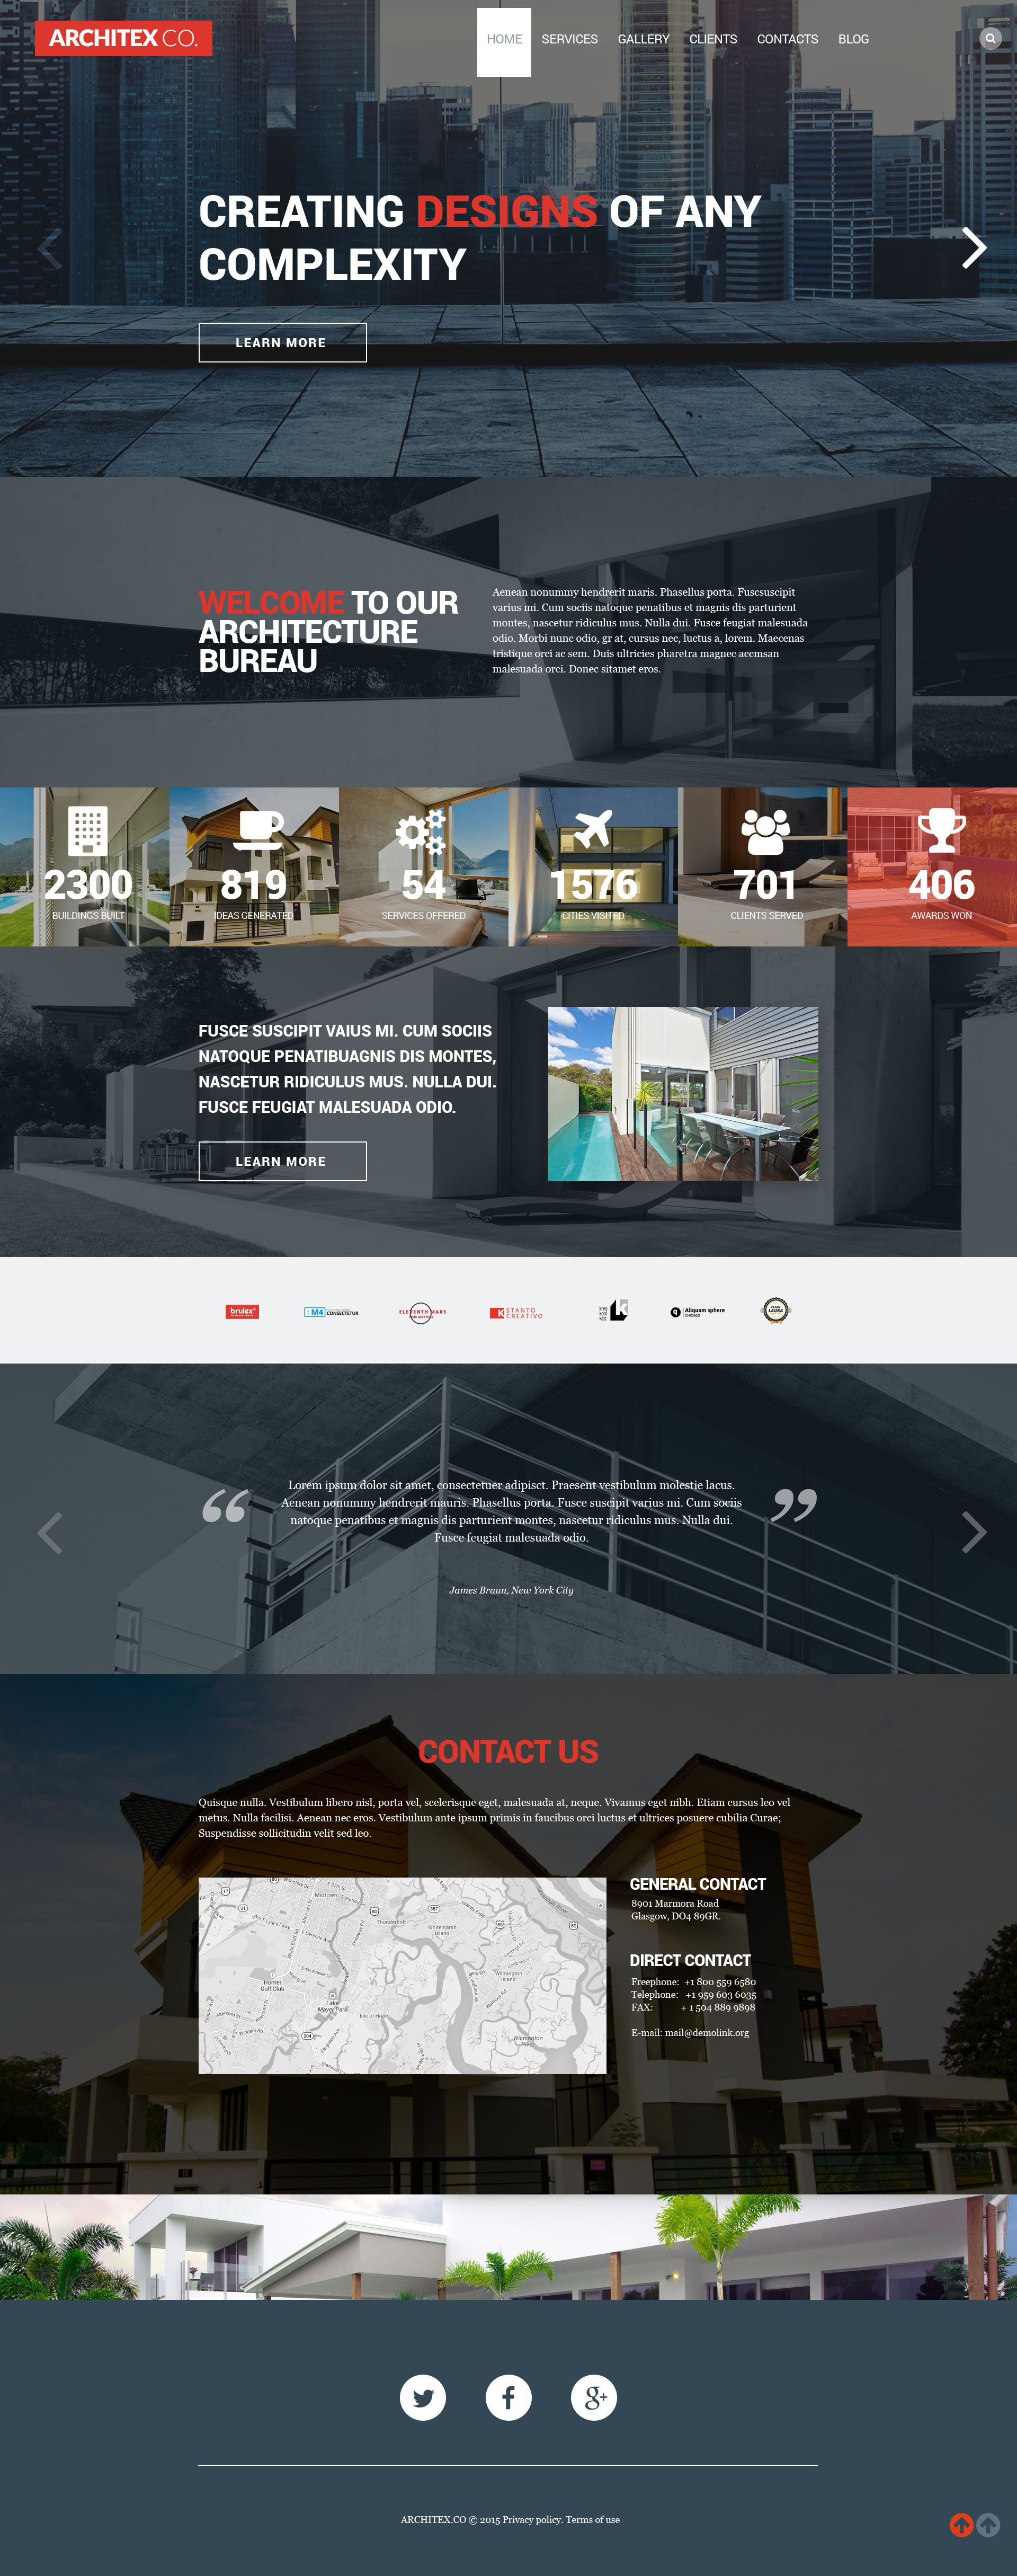 Architecture №53384 - скриншот